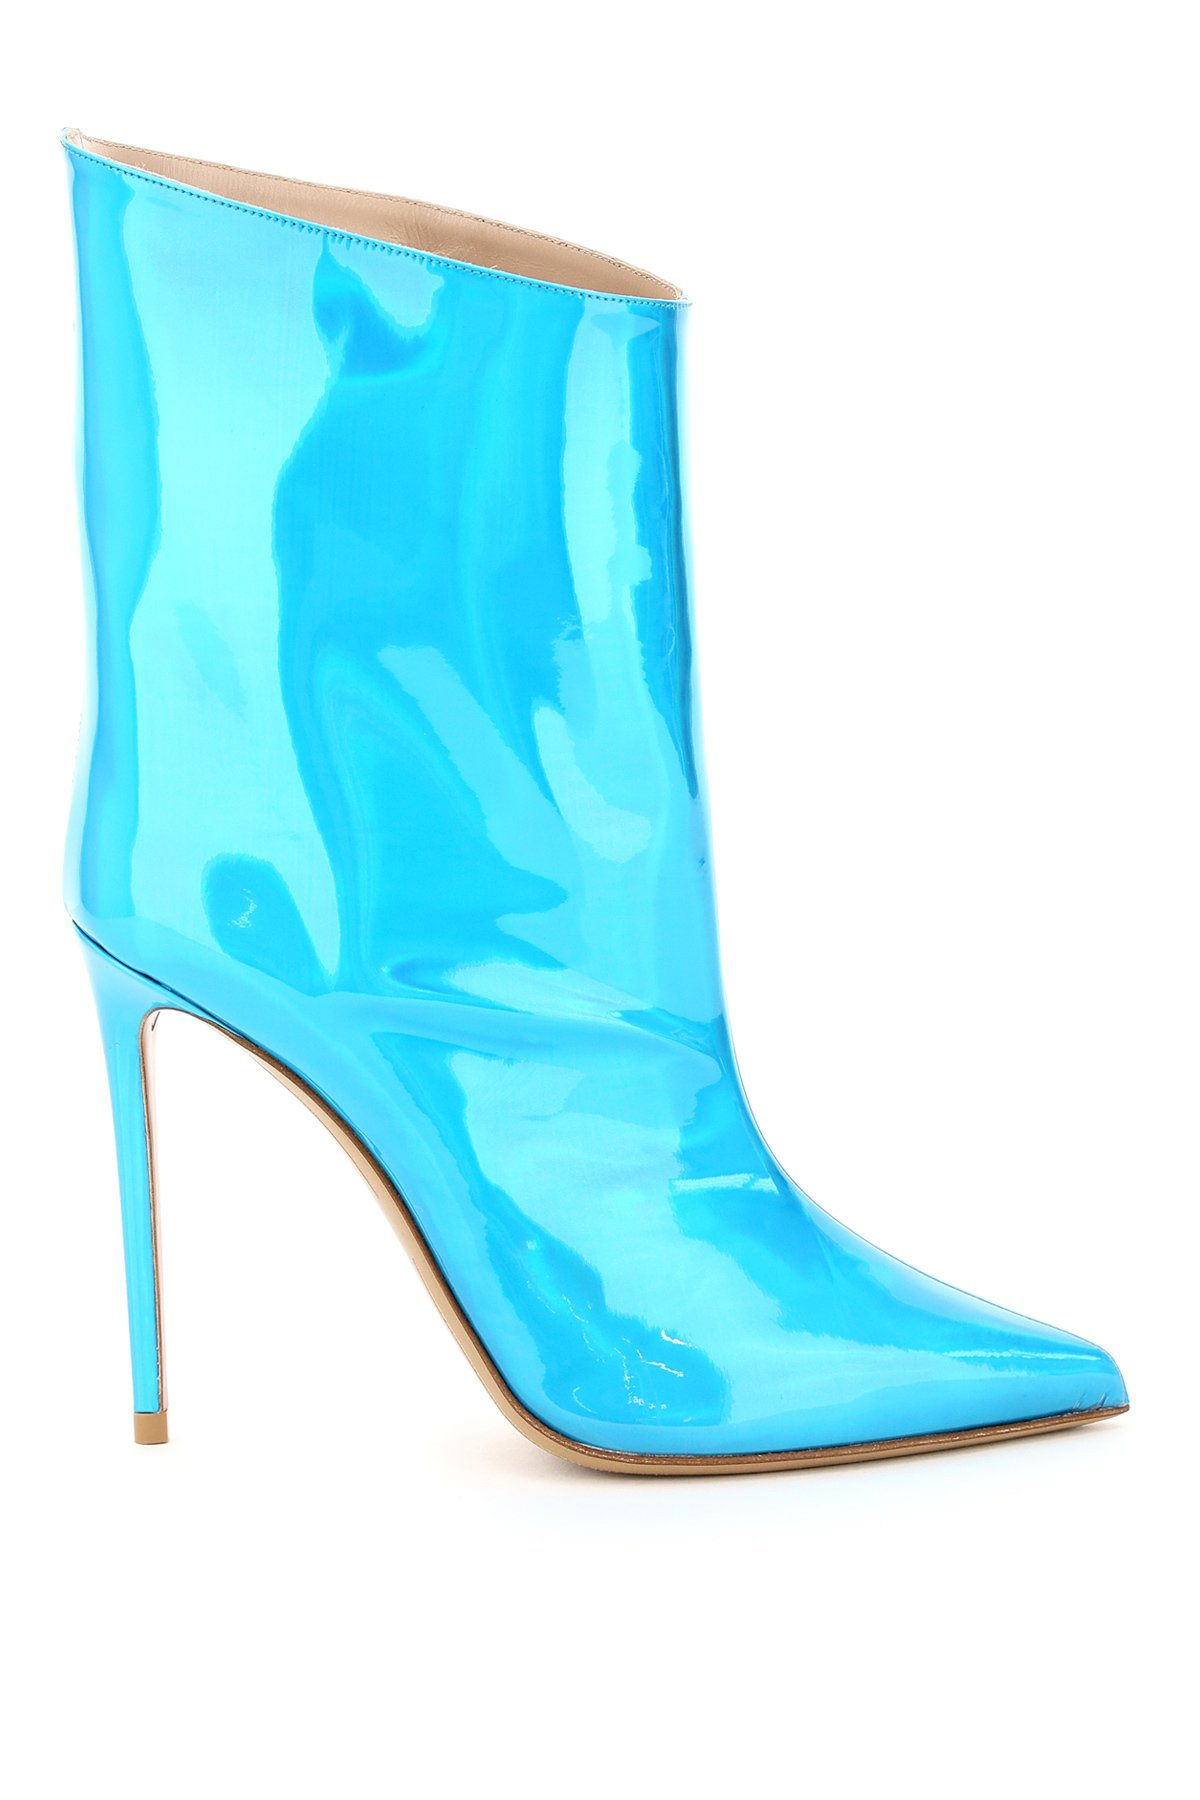 Alexandre vauthier stivali hologram blue alex